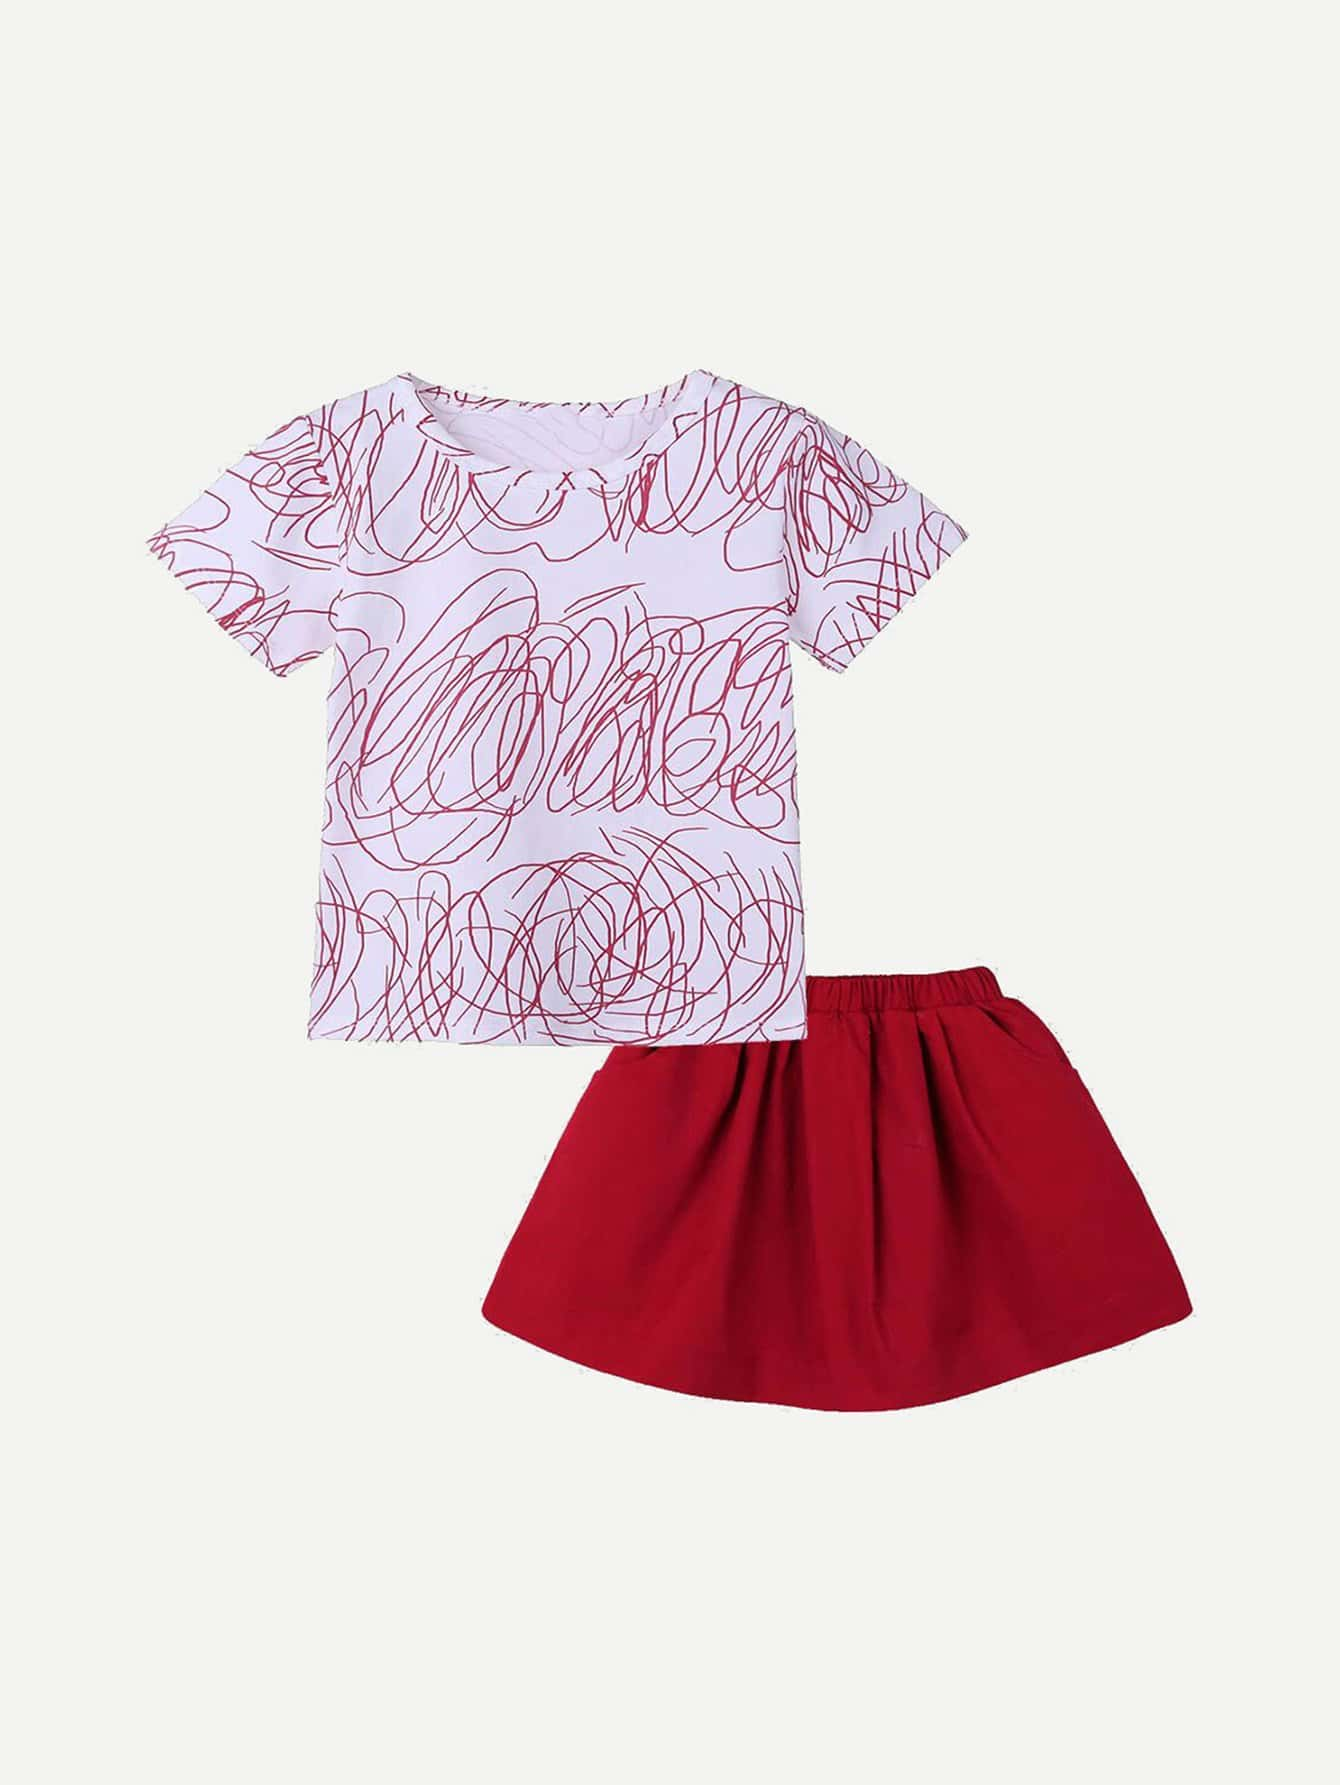 Girls Line Print Tee With Plain Pleated Skirt plain t shirt a line print skirt 2 piece sets